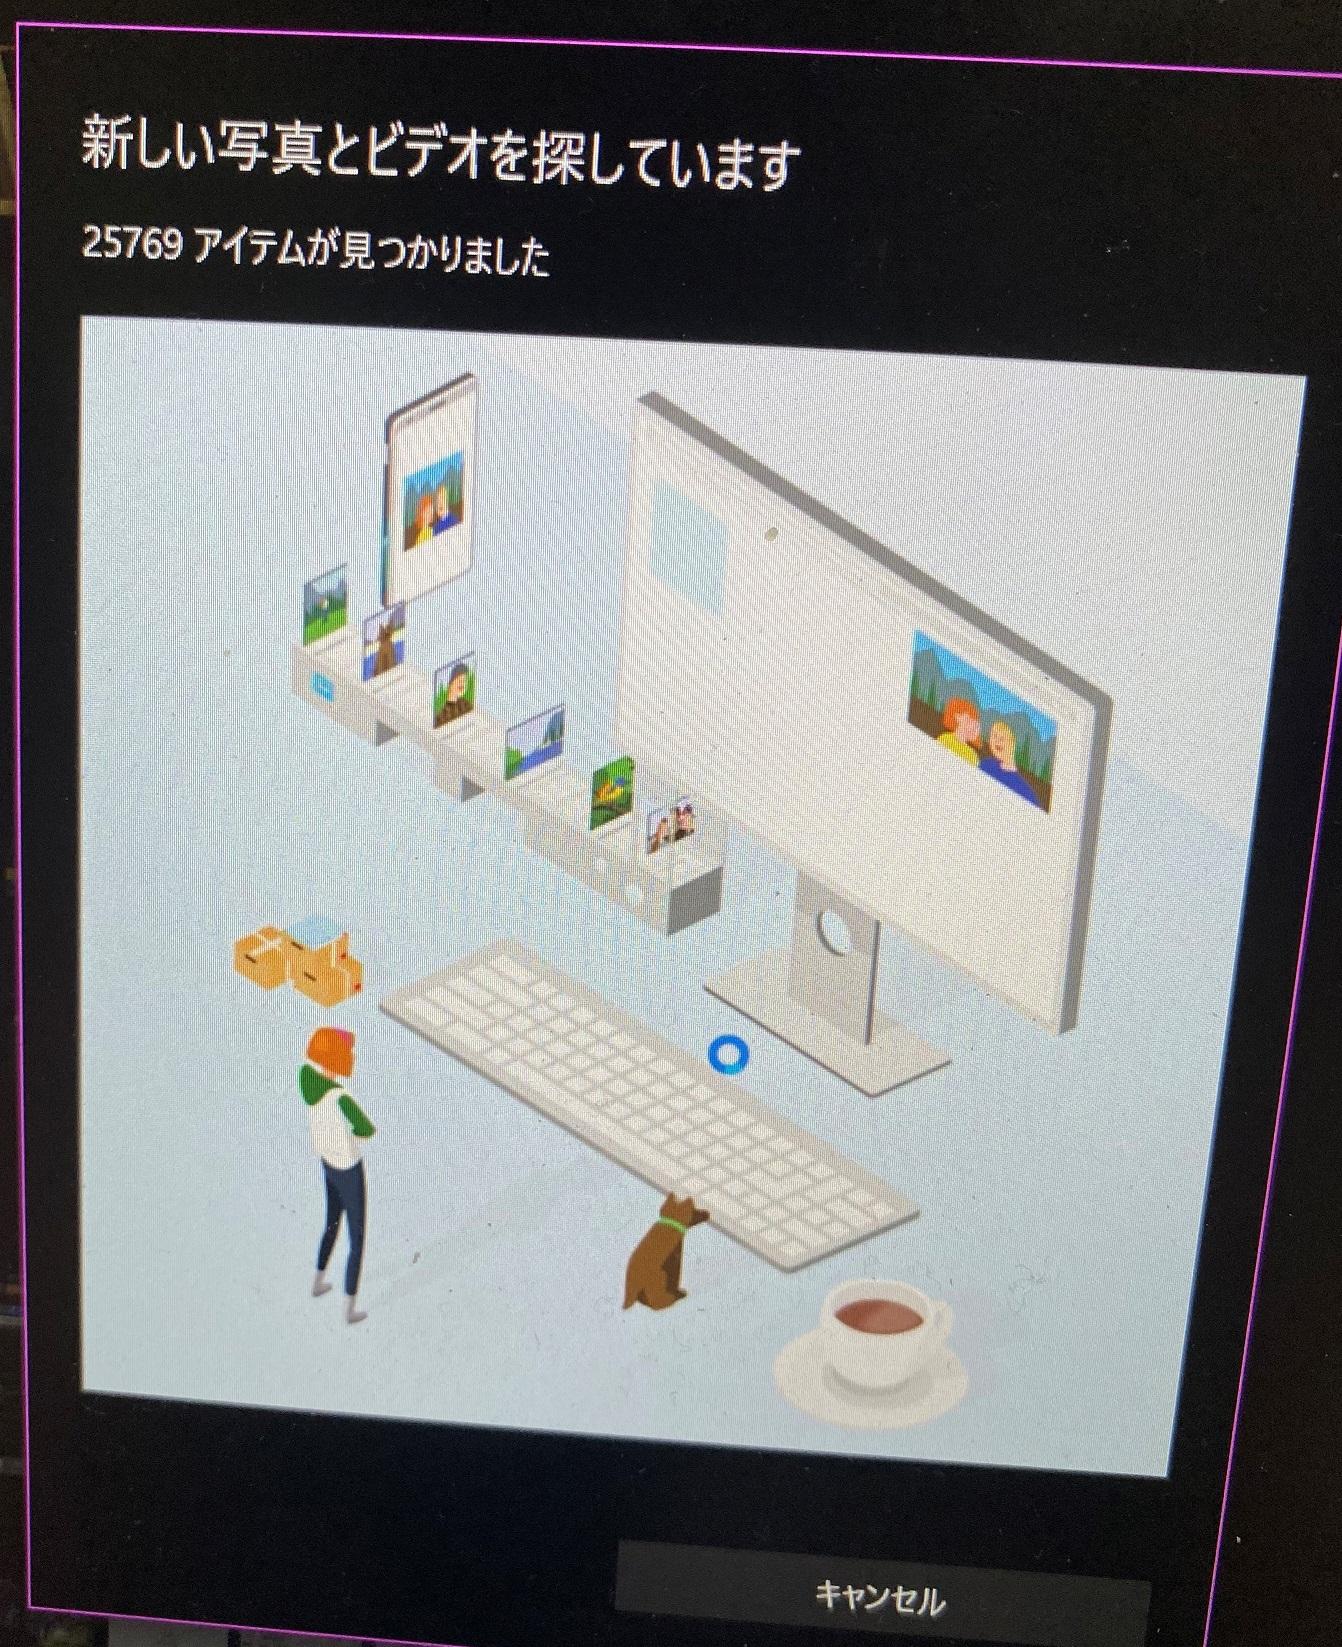 Iphone の 写真 を パソコン に 取り込む windows10